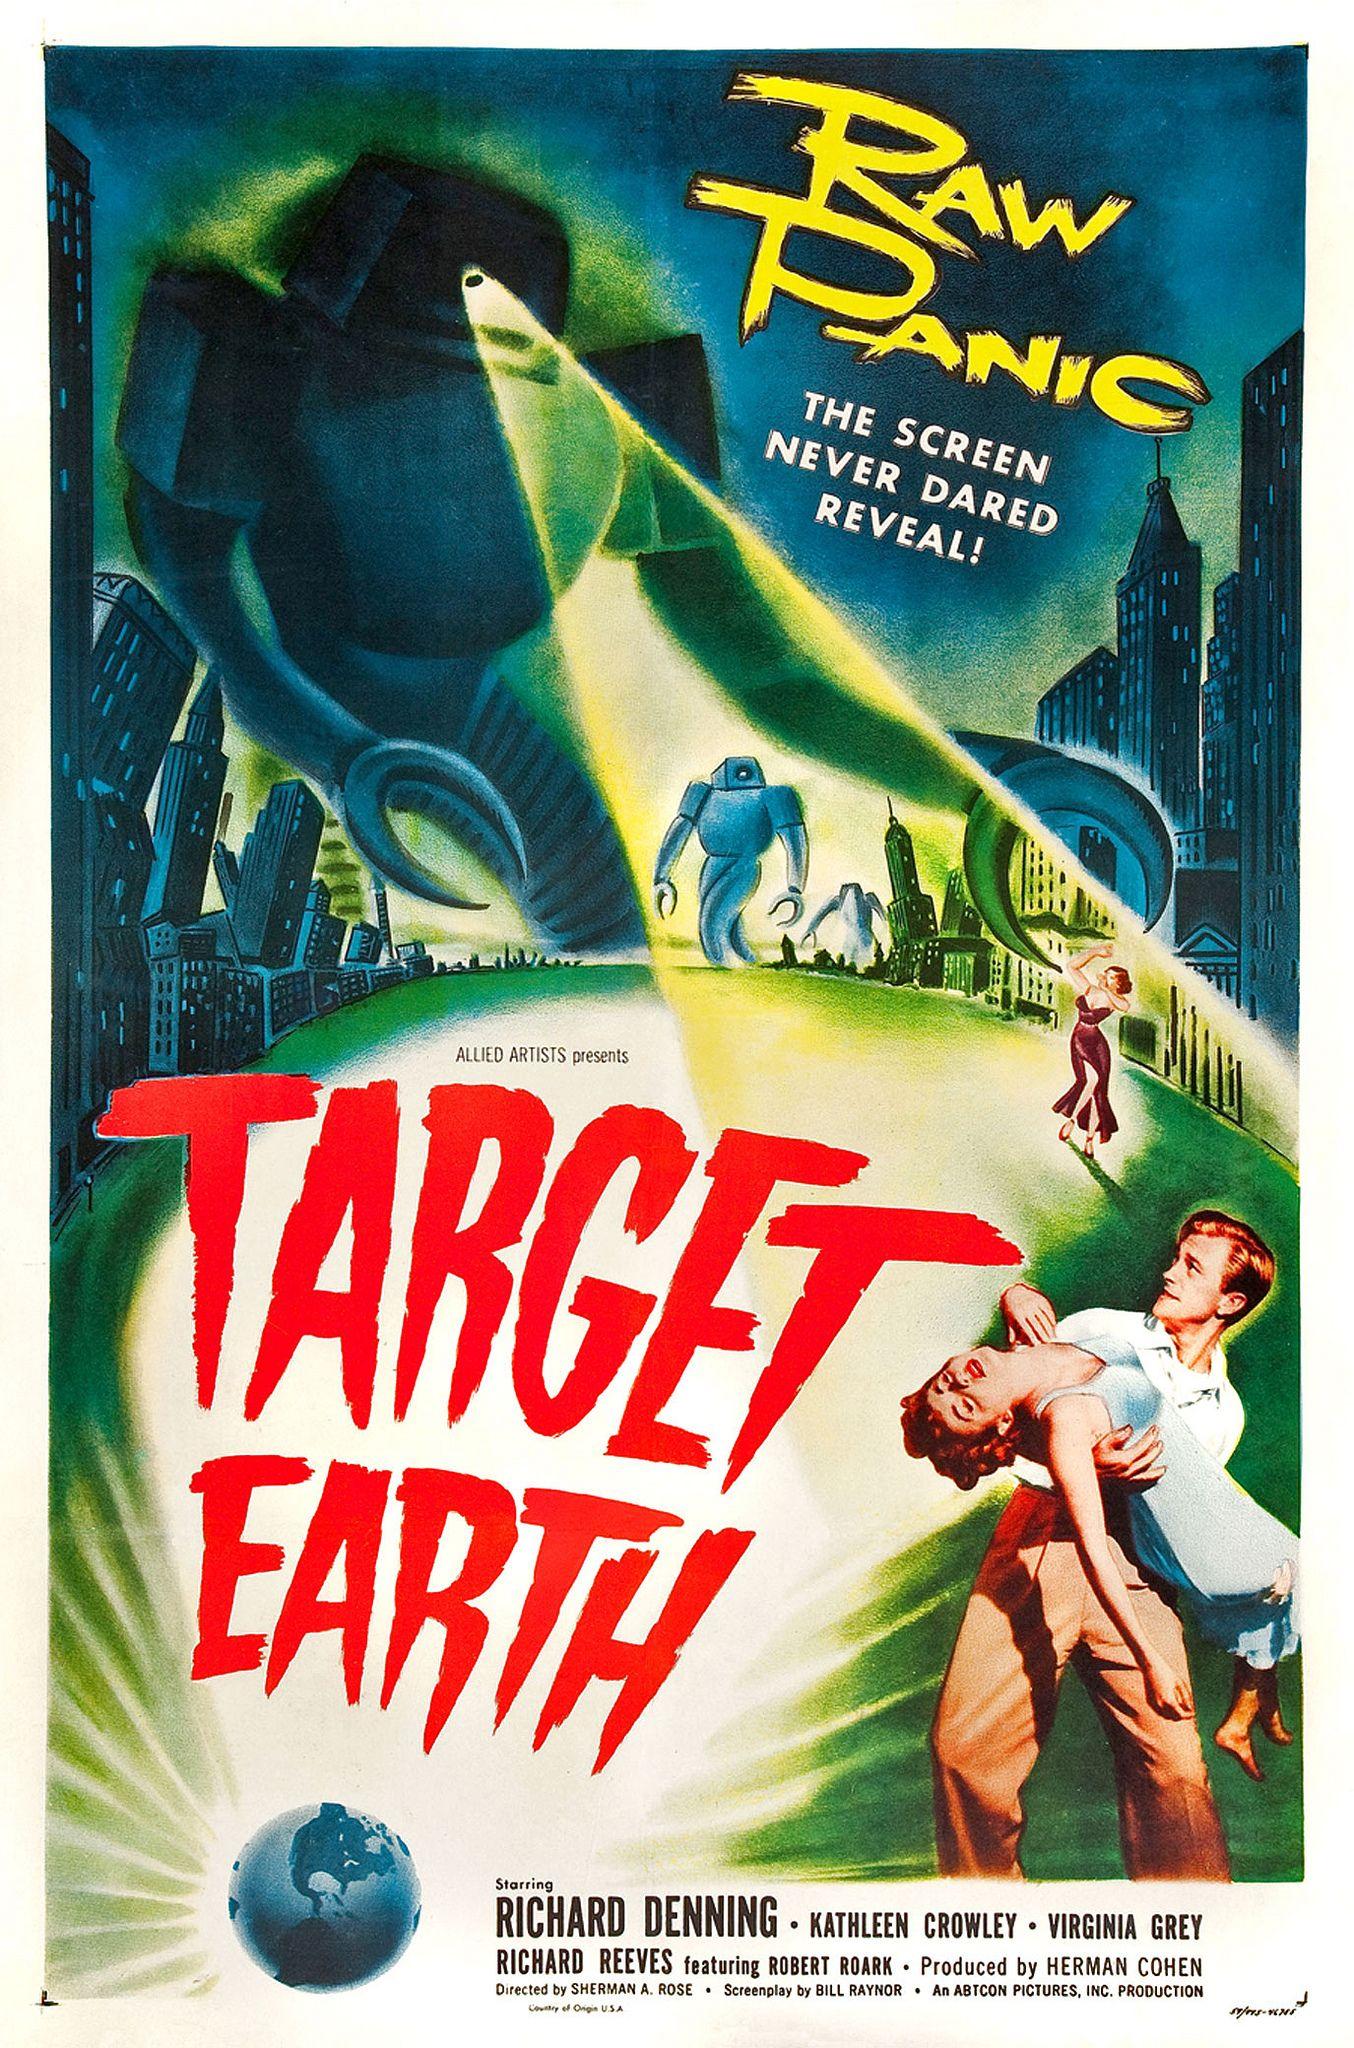 TARGET EARTH 01 VINTAGE B-MOVIE REPRODUCTION ART PRINT A4 A3 A2 A1